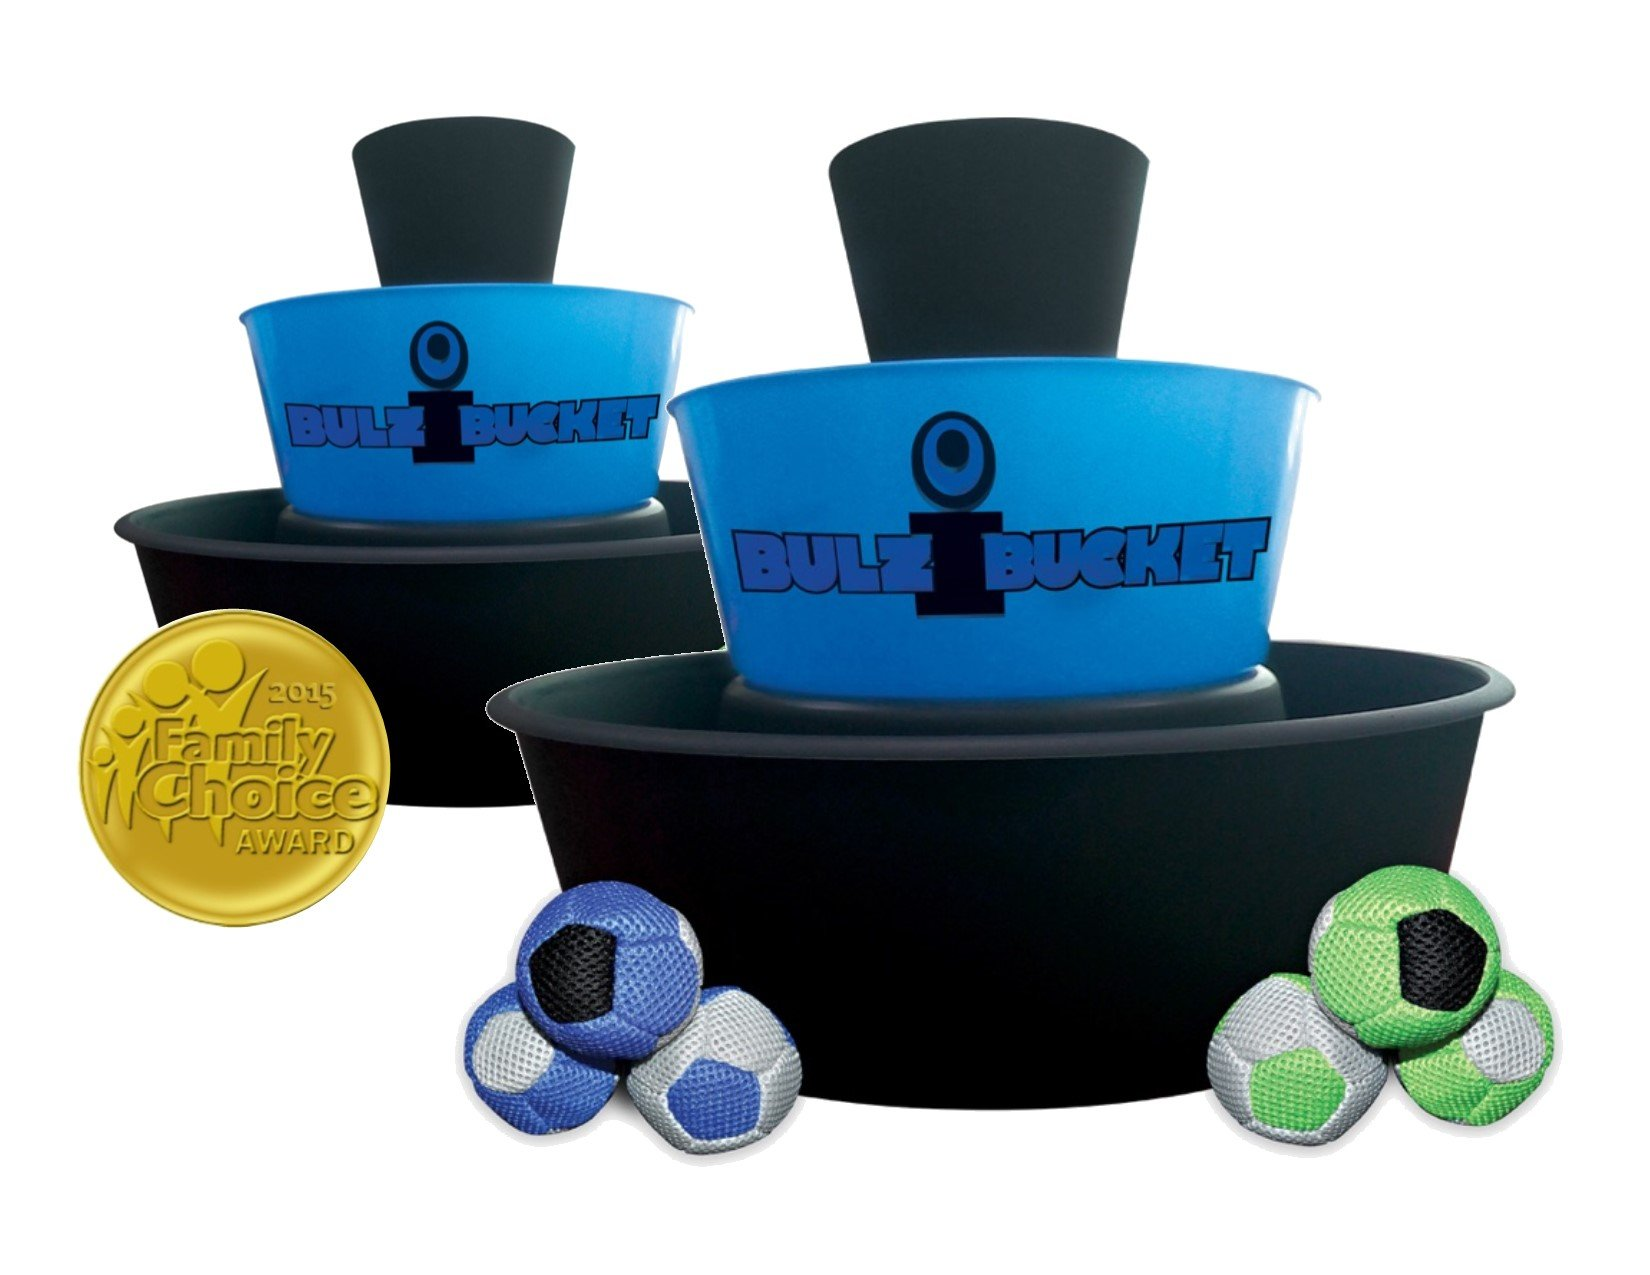 BULZiBUCKET Blue - Next Generation Cornhole - Indoor/Outdoor/Pool Game !!! by BULZiBUCKET